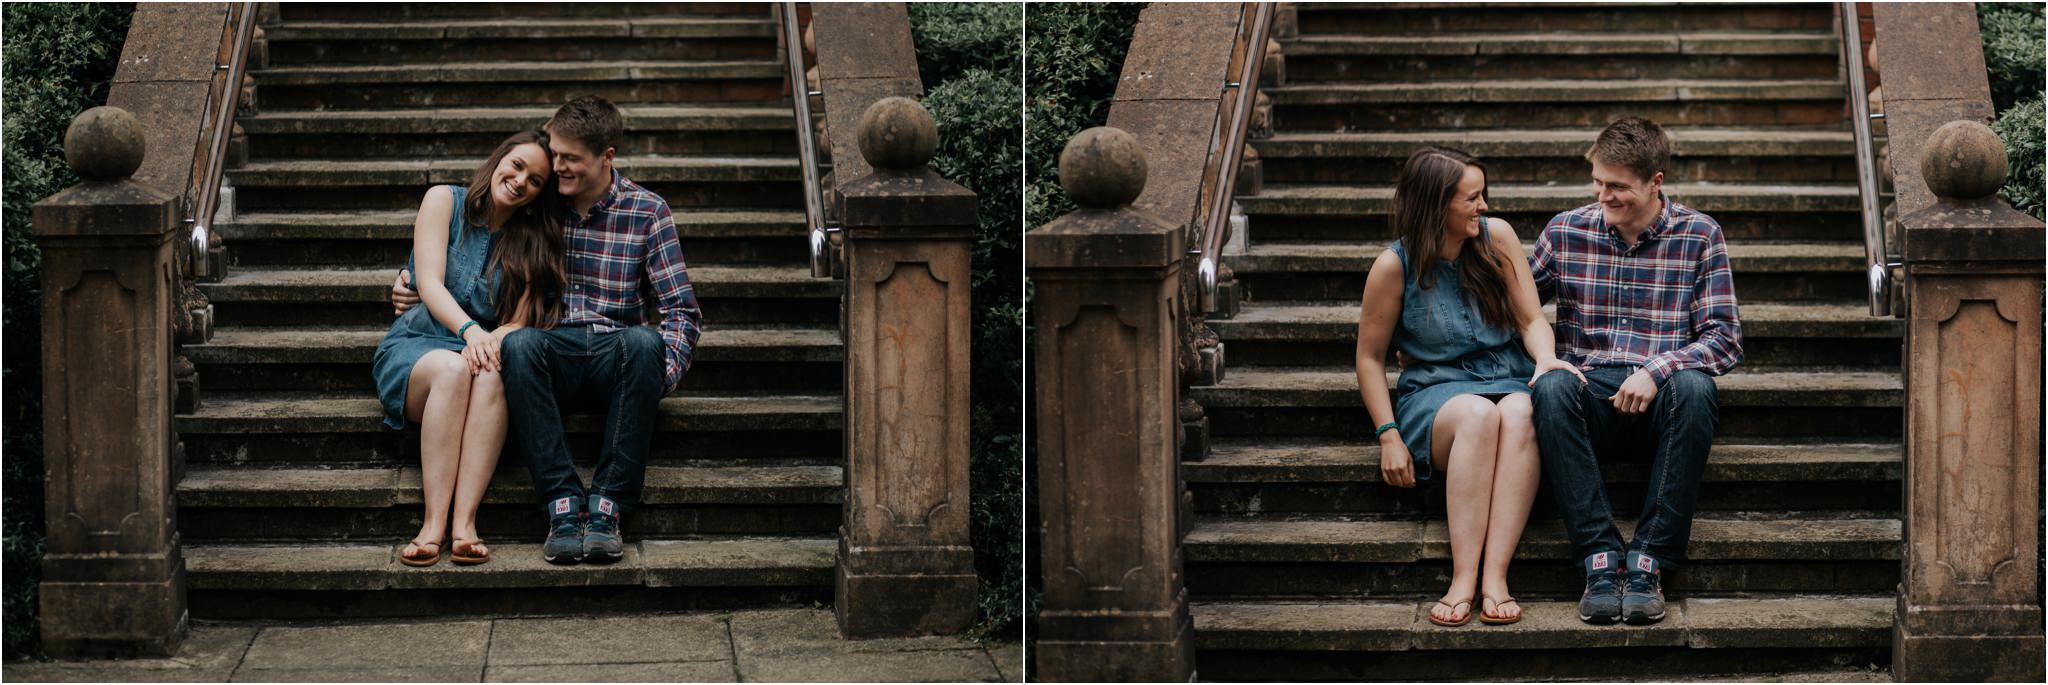 Photography 78 - Glasgow Wedding Photographer - Corrie Jonathan Glasgow West End_0005.jpg